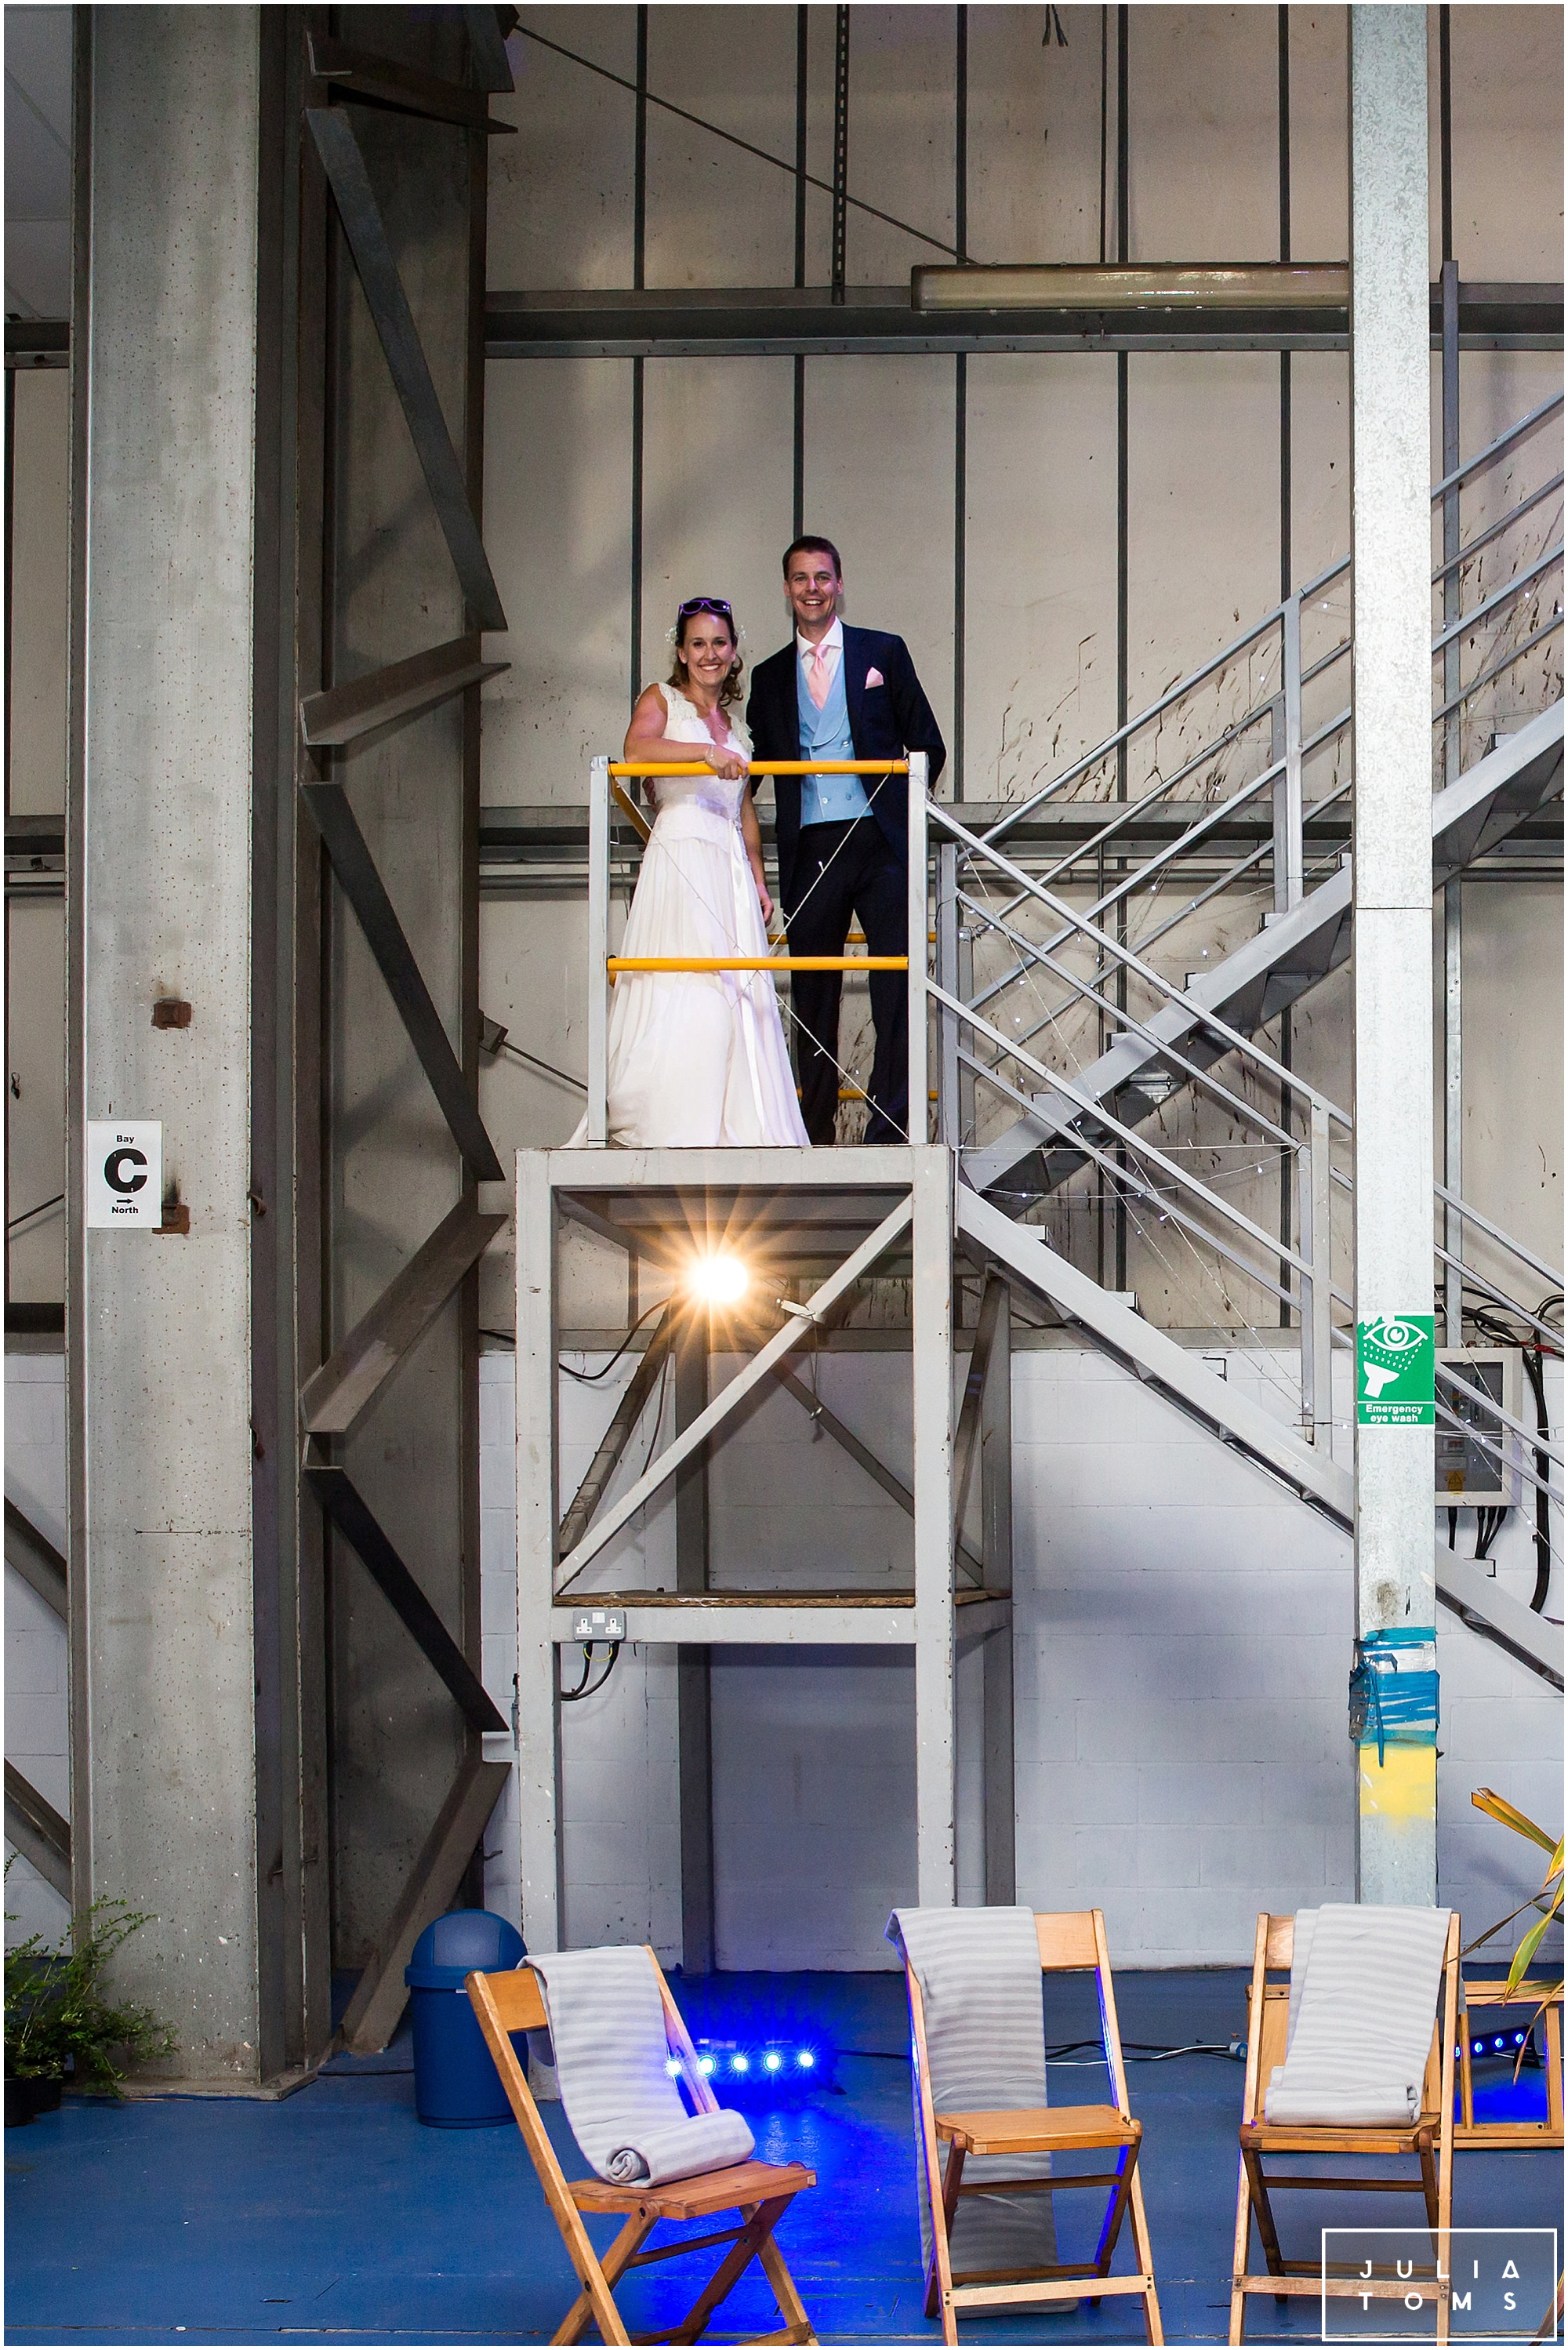 julia_toms_chichester_wedding_photographer_portsmouth_054.jpg